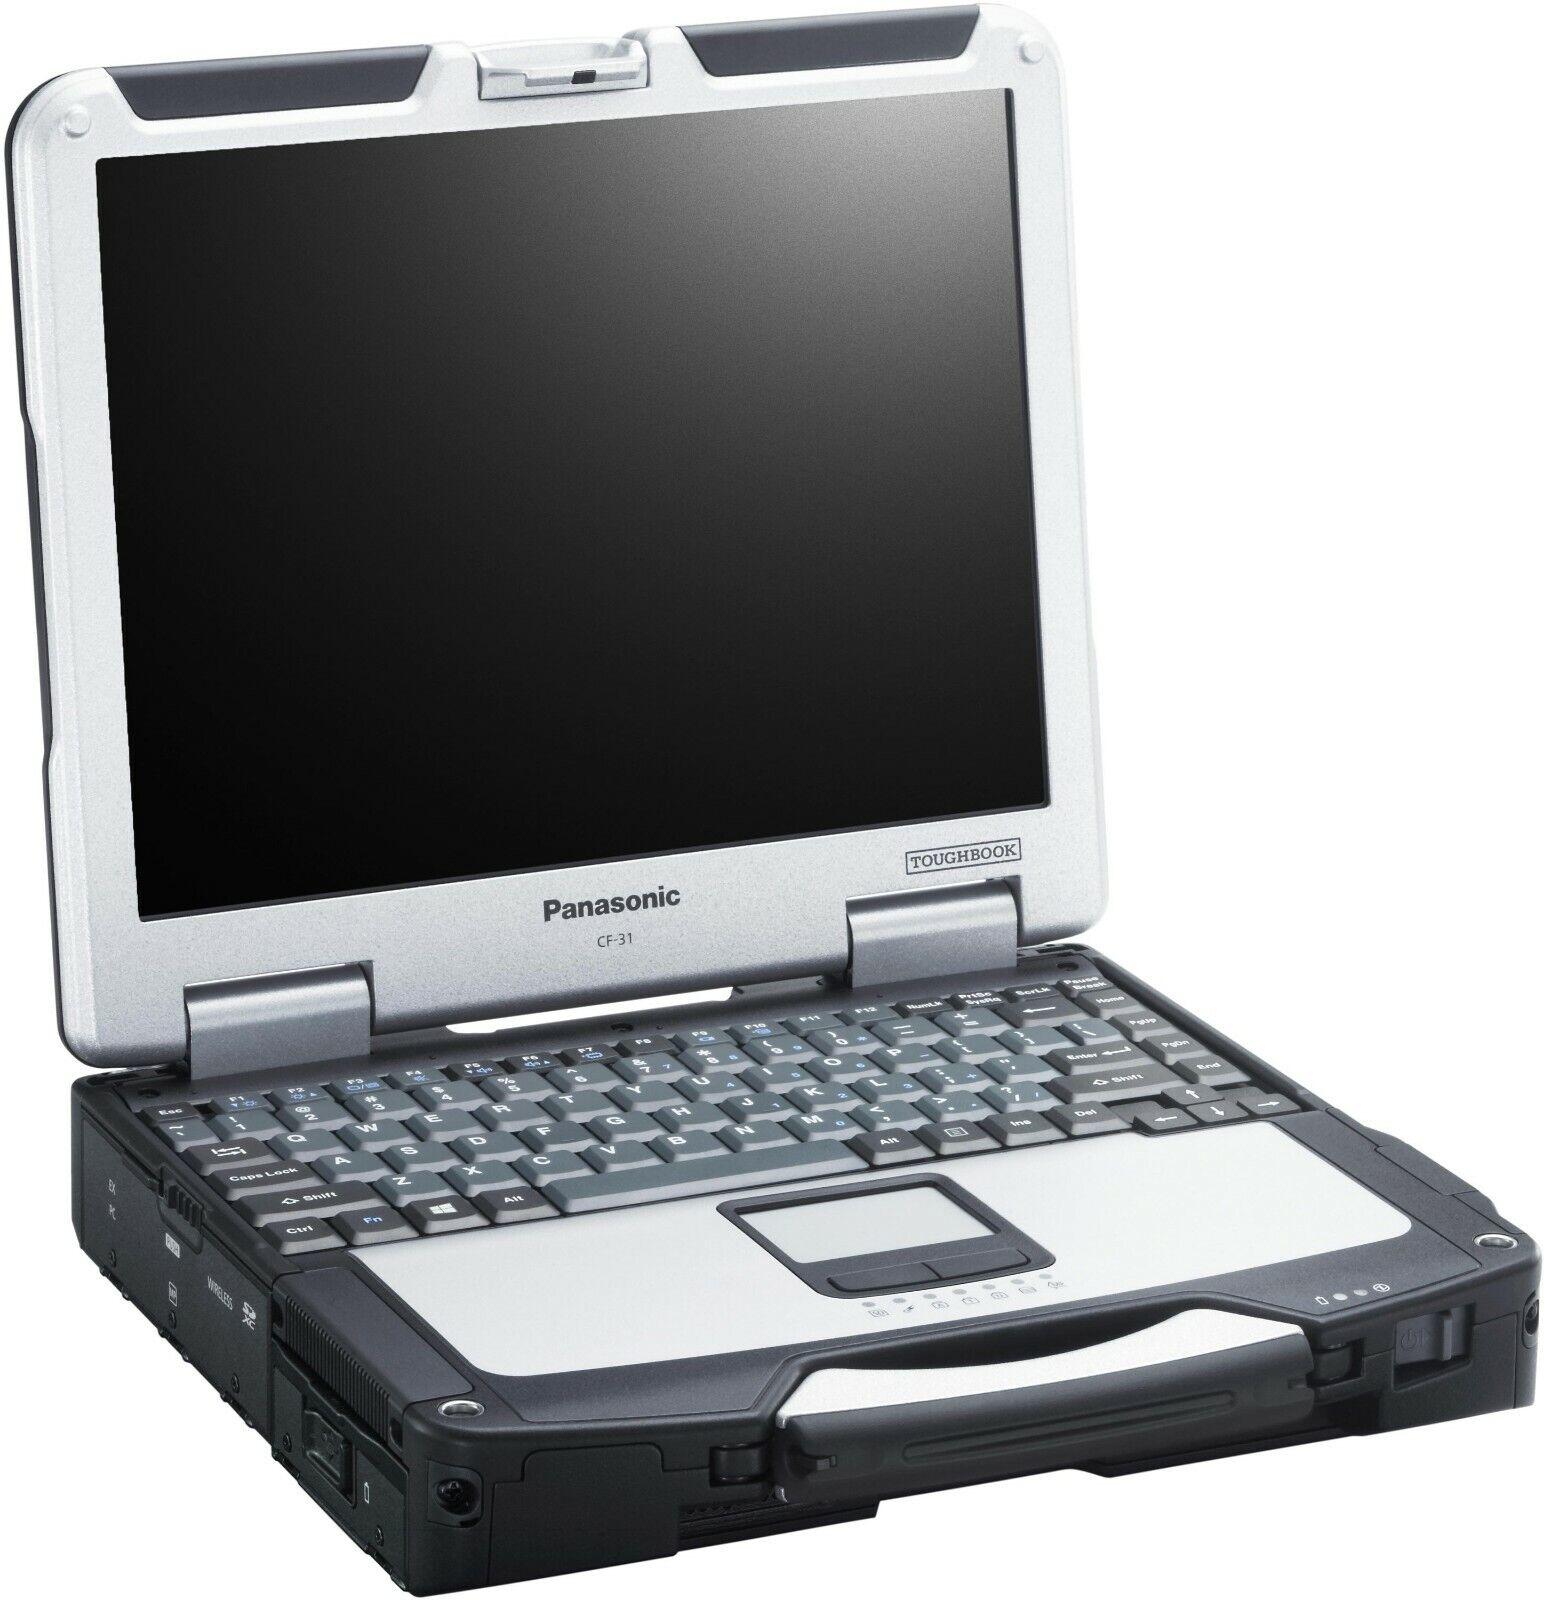 PANASONIC TOUGHBOOK Rugged Laptop CF-31WBM7BLM i5-3340M 2.7GHz,500GB,8GB,BT,GPS